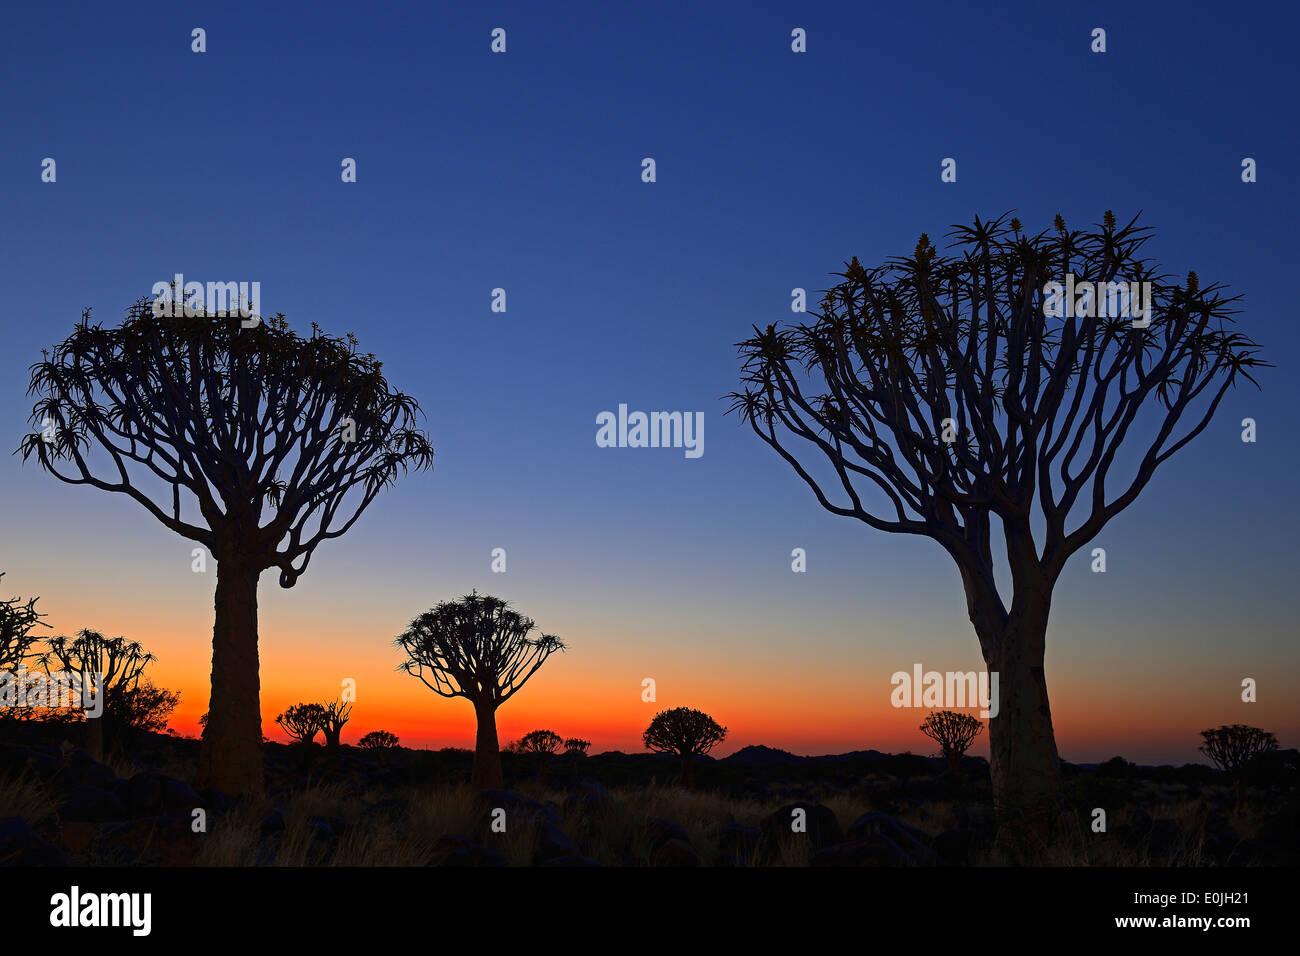 Koecherbaum oder Quivertree (Afrikaans: Kokerboom, Aloe dichotoma) bei Sonnenuntergang , Keetmanshoop, Namibia, Afrika - Stock Image